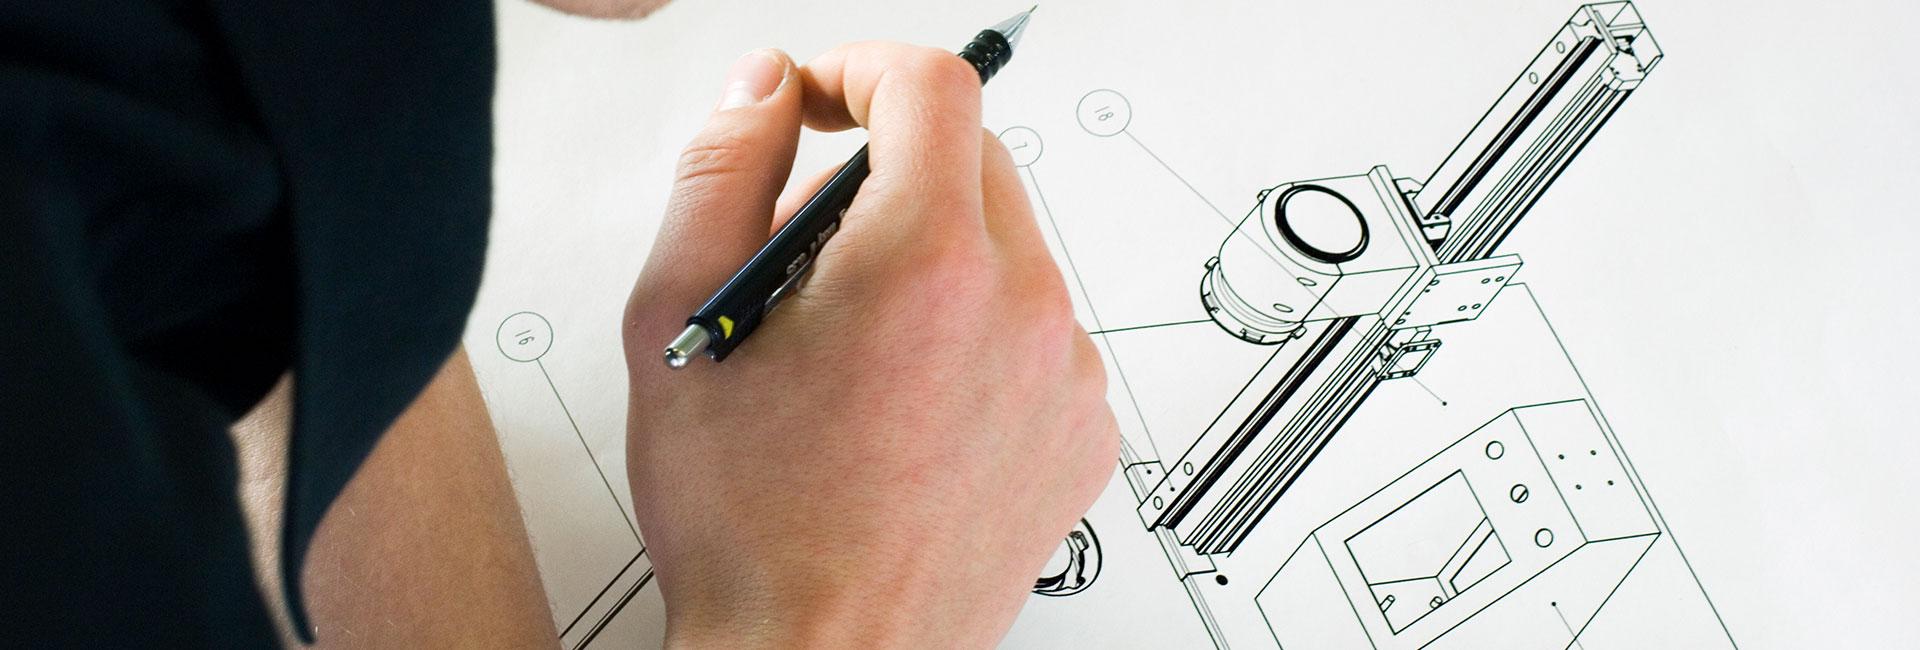 konstruktion elektrotechnik